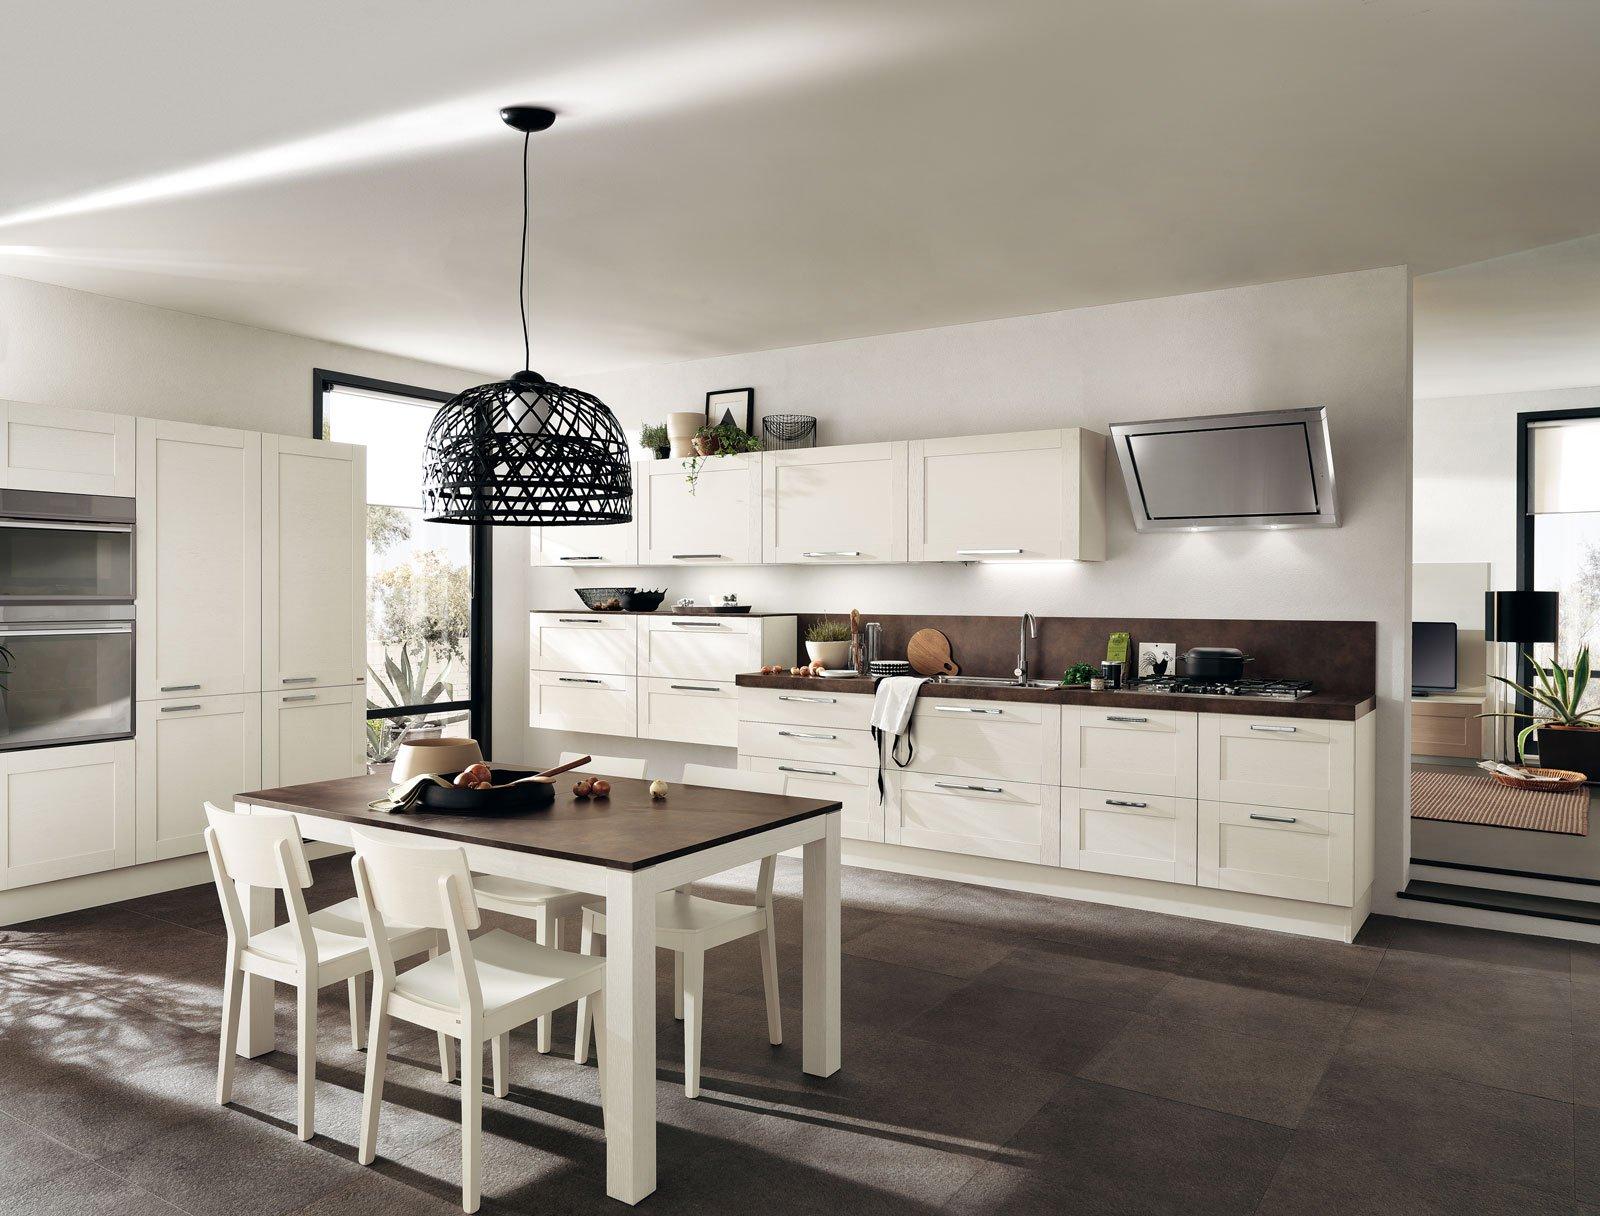 cucine in legno: tradizionali, country o moderne - cose di casa - Cucine Bianche E Grigie Scavolini